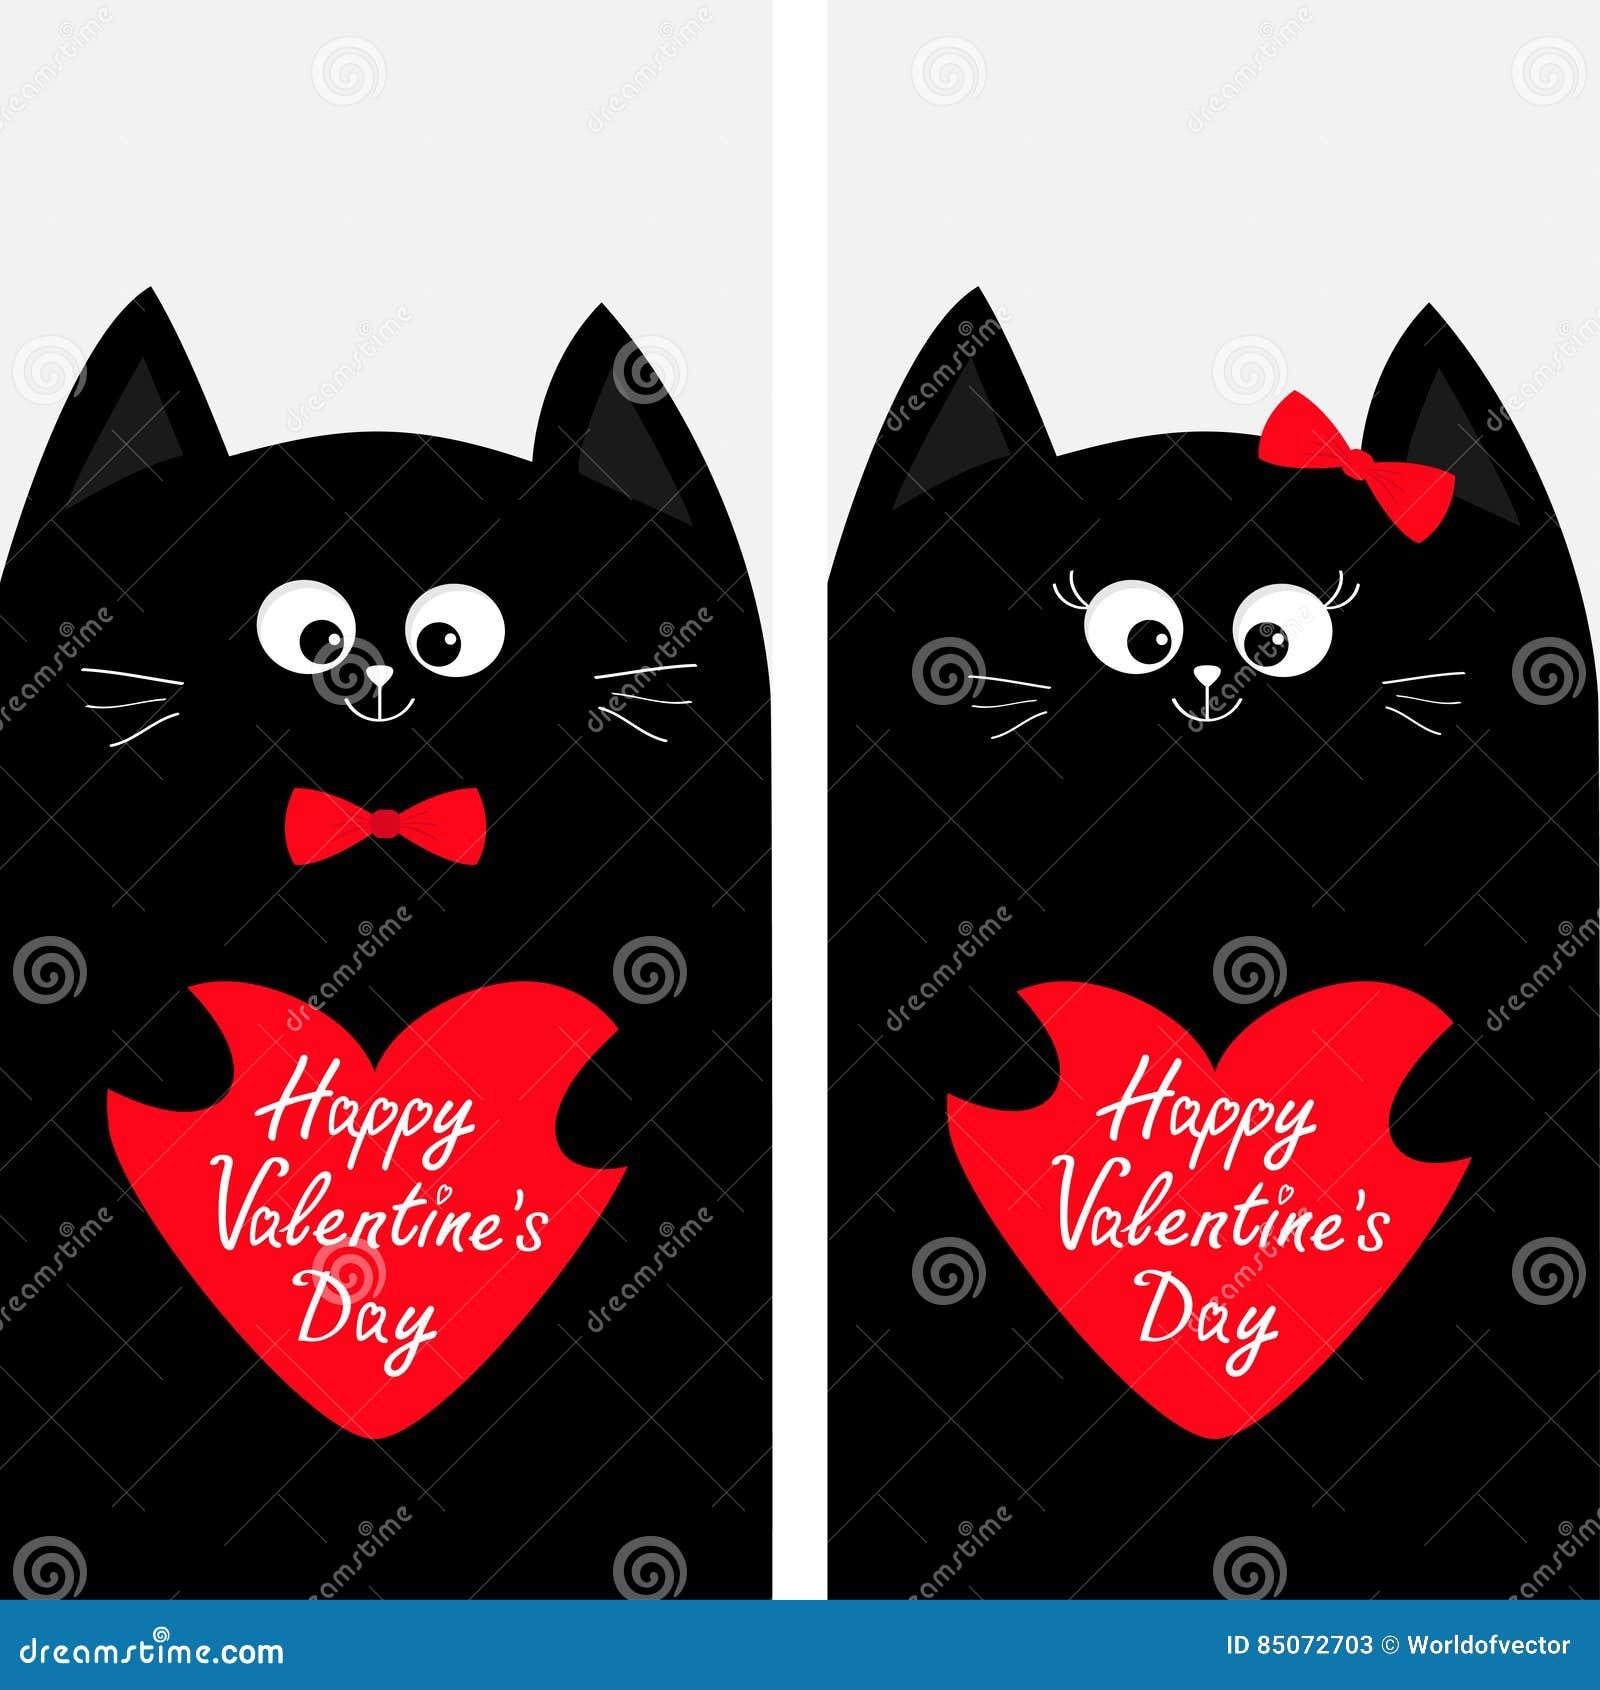 Funny Red Heart Character Cartoon Vector | CartoonDealer ...